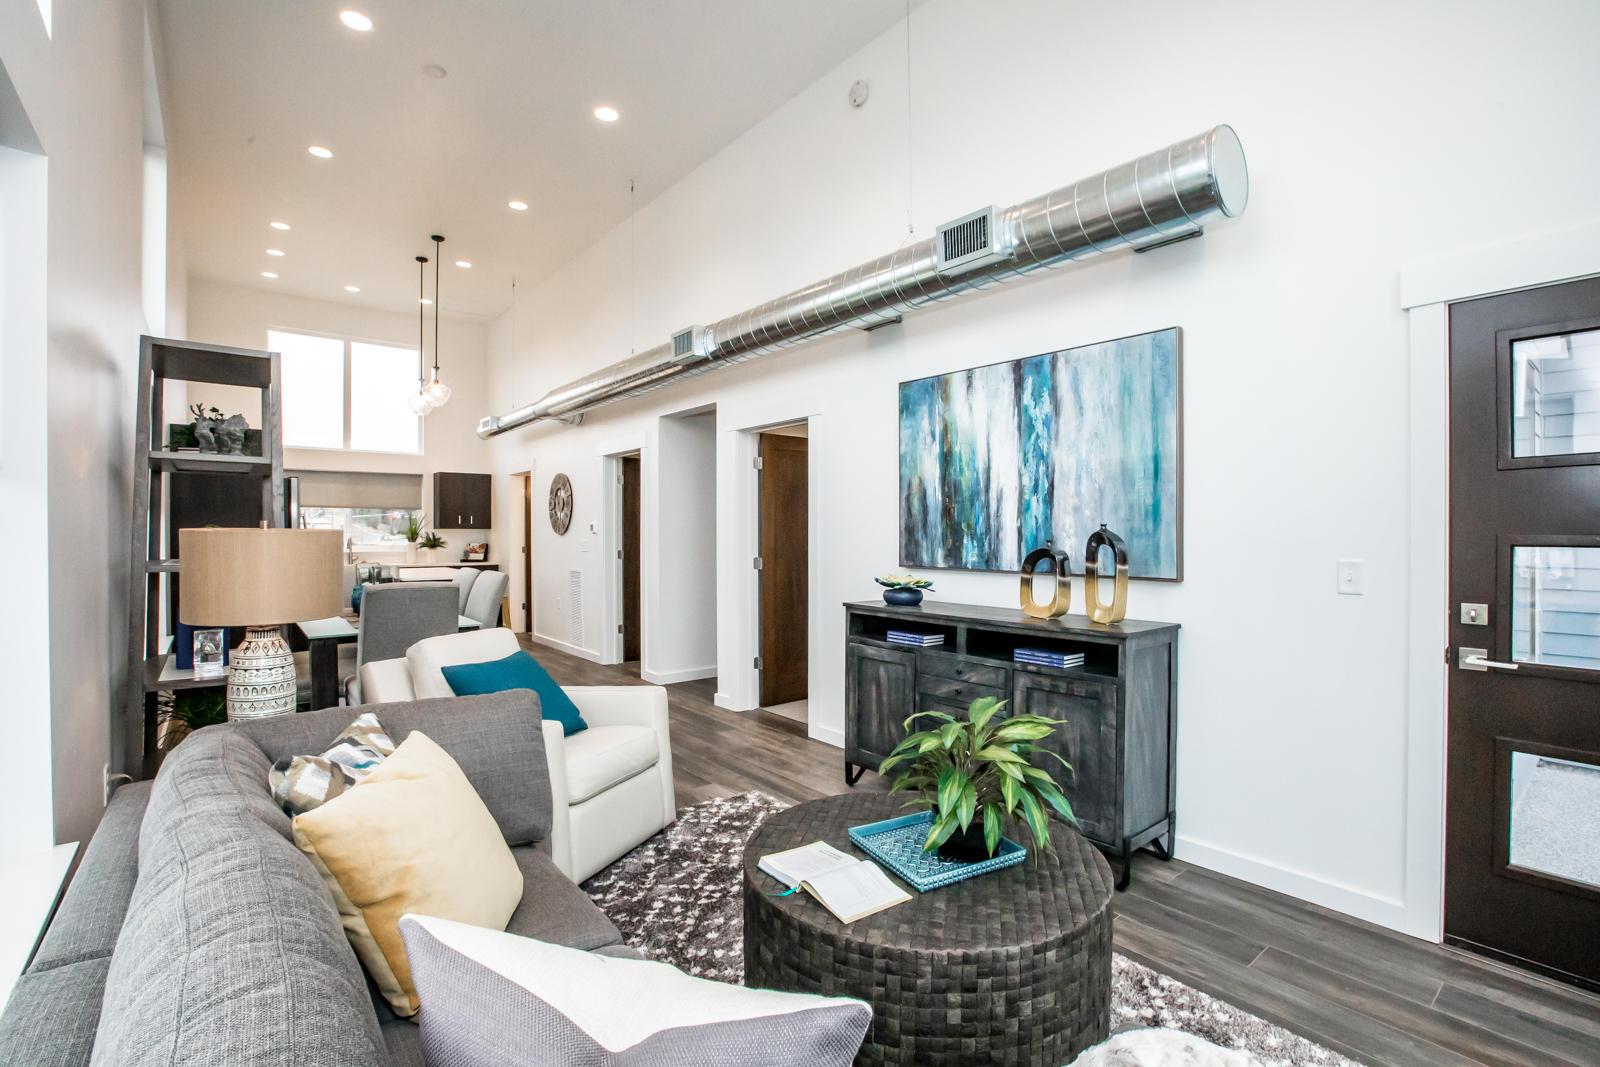 5 Living Room Into Kicthen